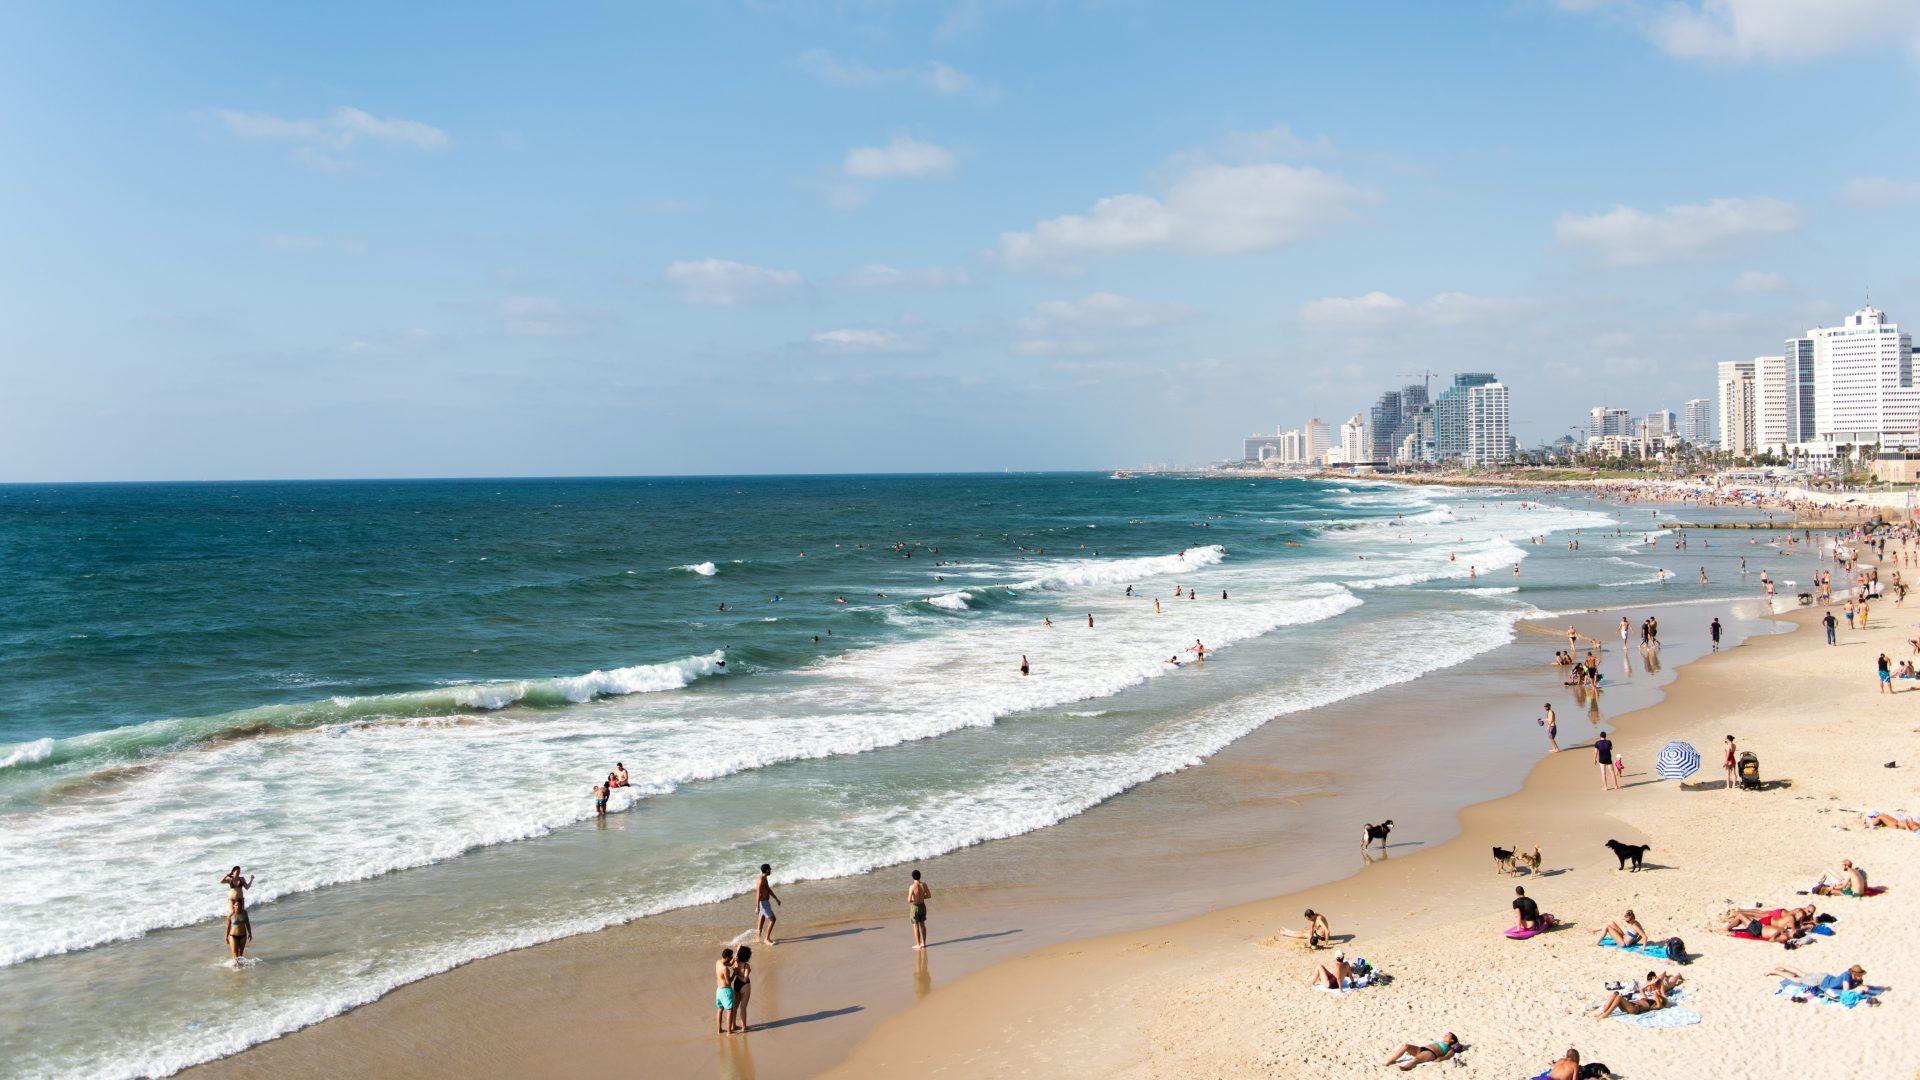 Enjoy the summer in Israel